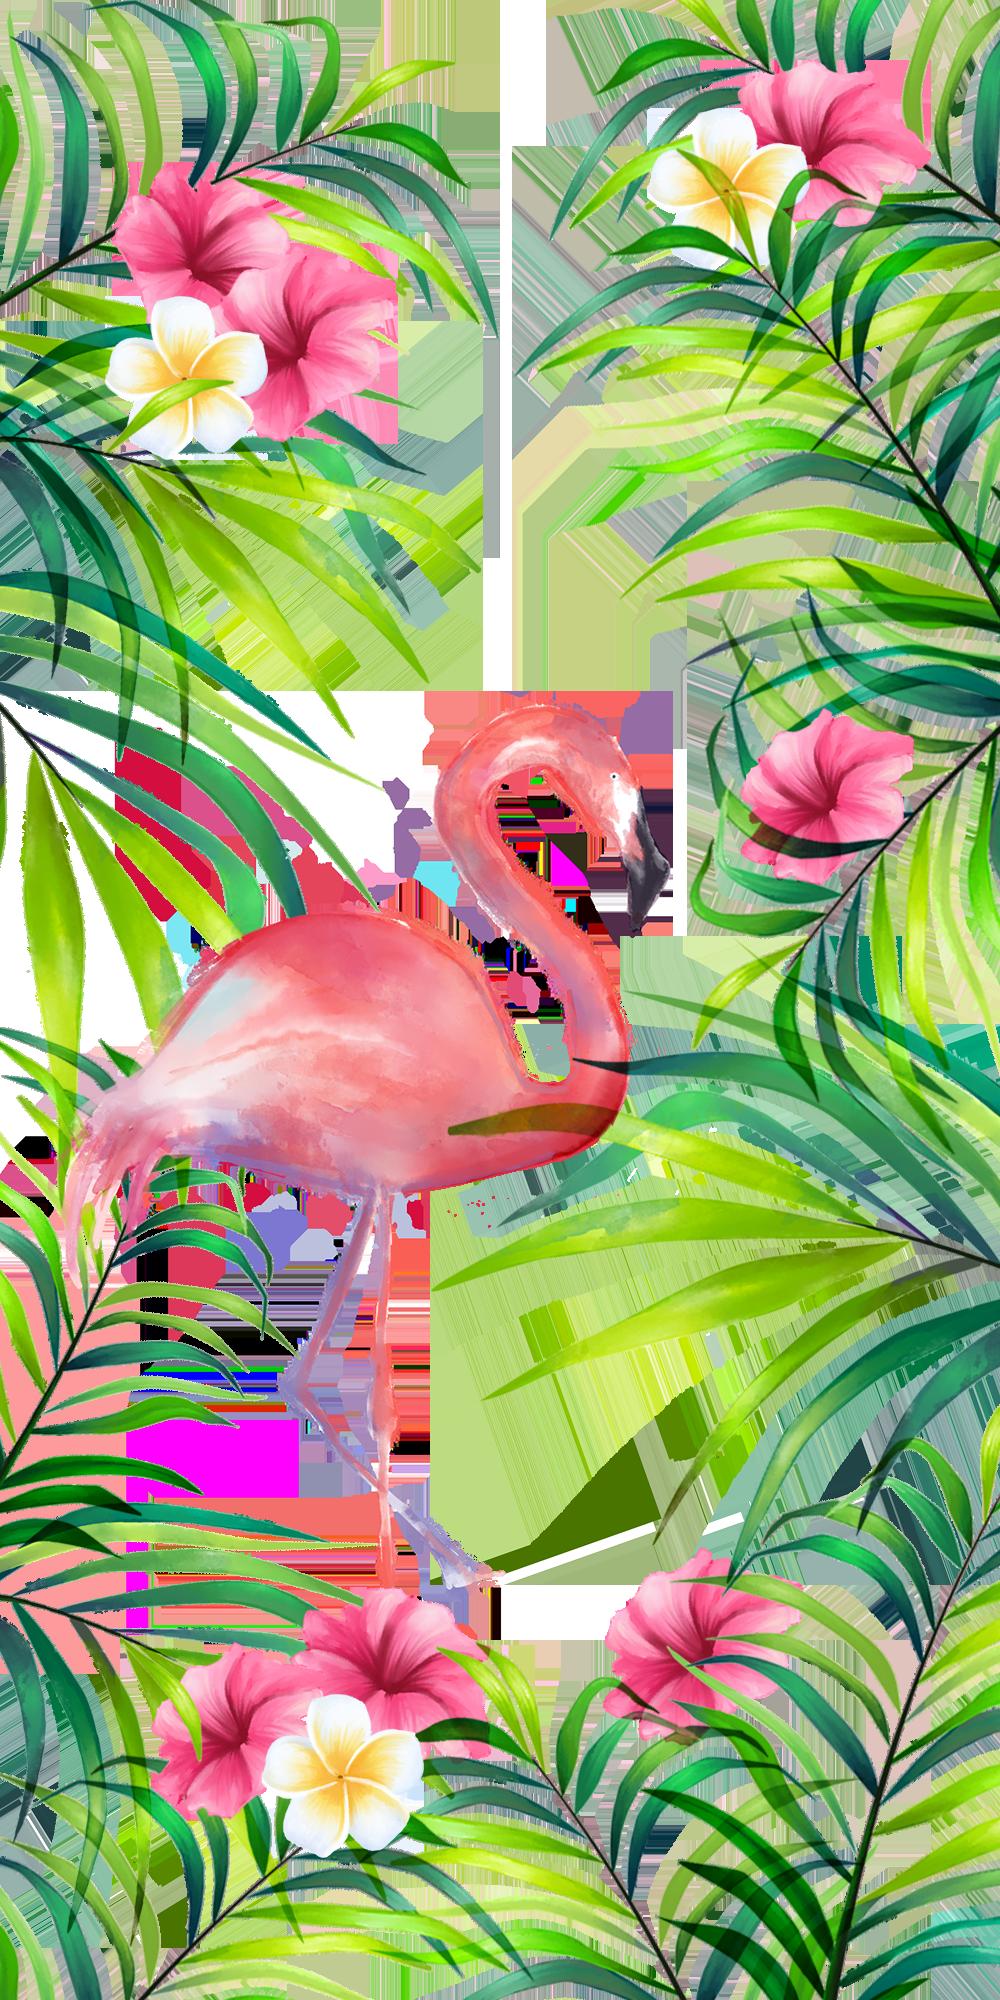 Pink Flamingo Casetify Iphone Art Design Illustration Animals Flamingos Desenho Decoracao Flamingo Flamingos